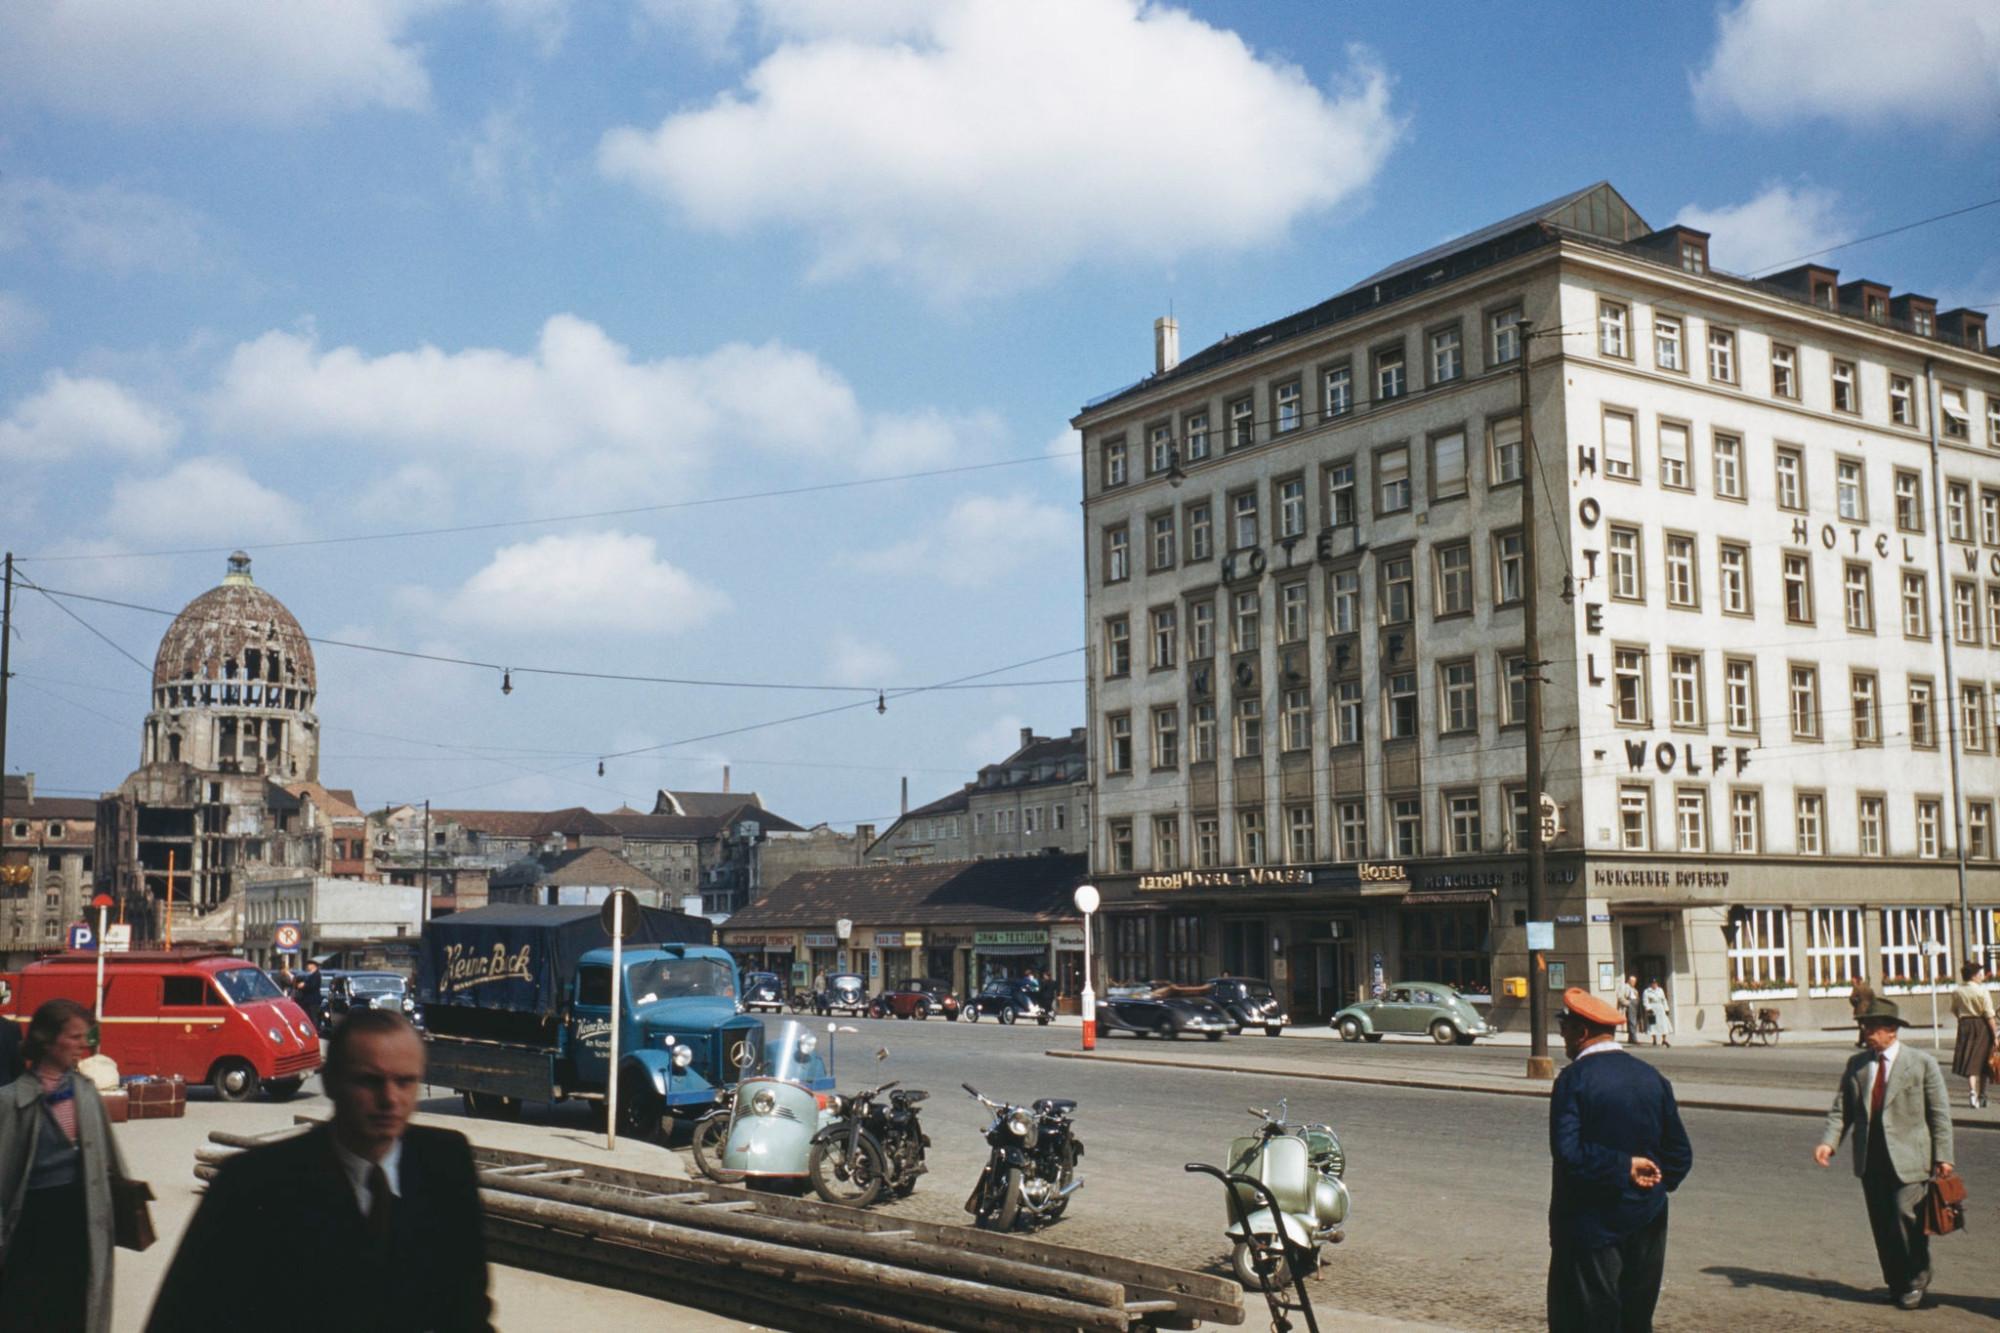 1960c Munich Hotel Wolff on the Arnulfstrasse in Munich by Emil Muench